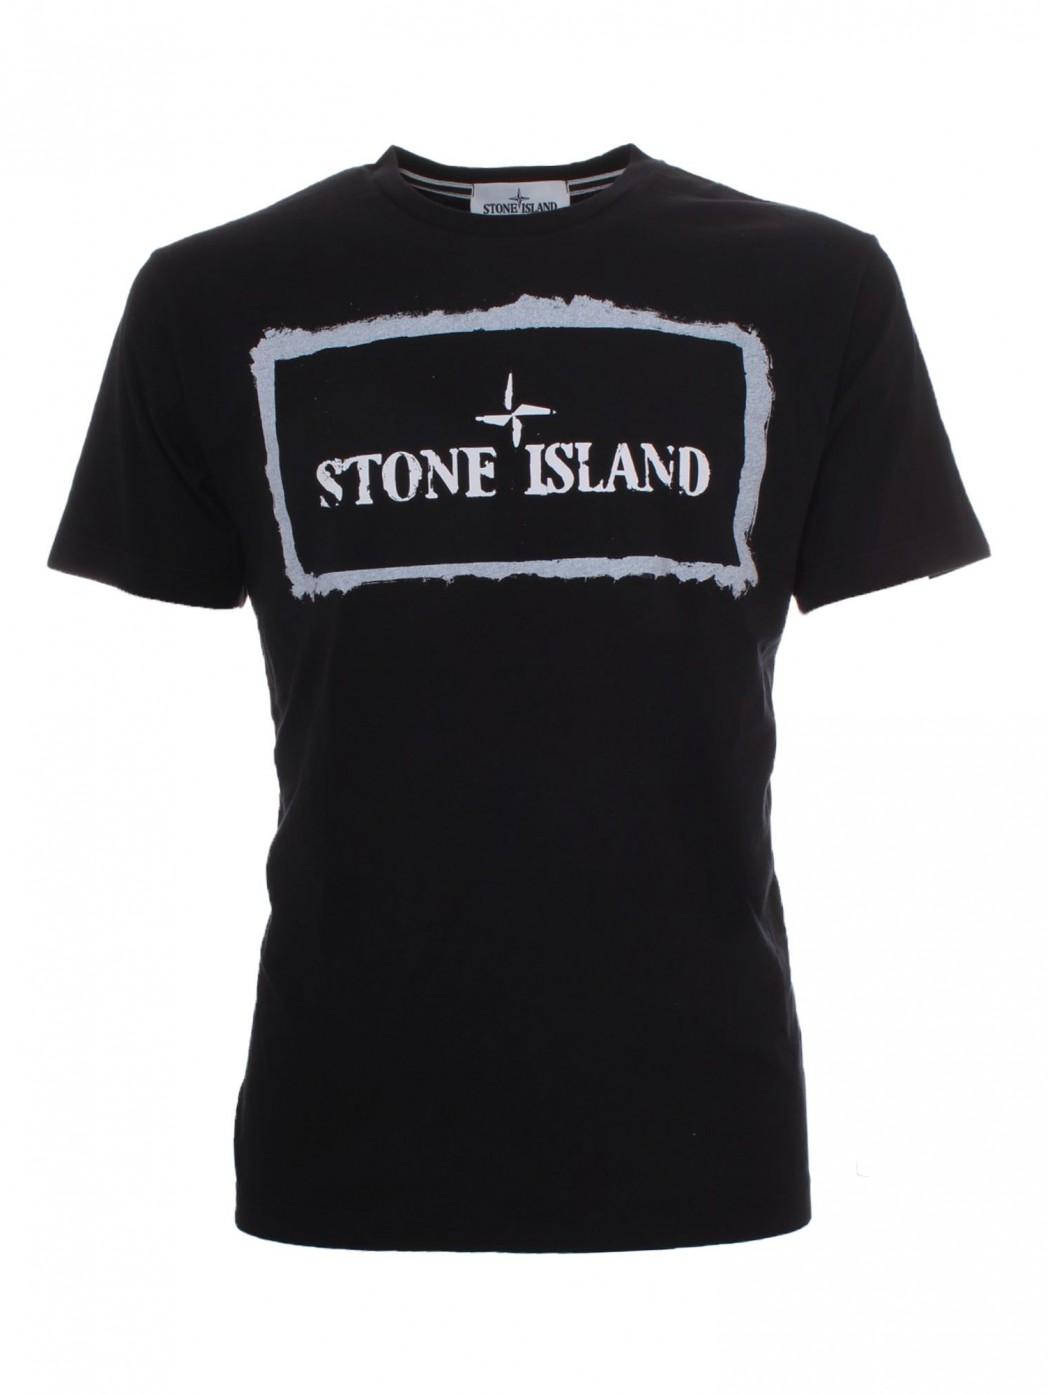 T-SHIRT STONE ISLAND 74152NS80 V0029